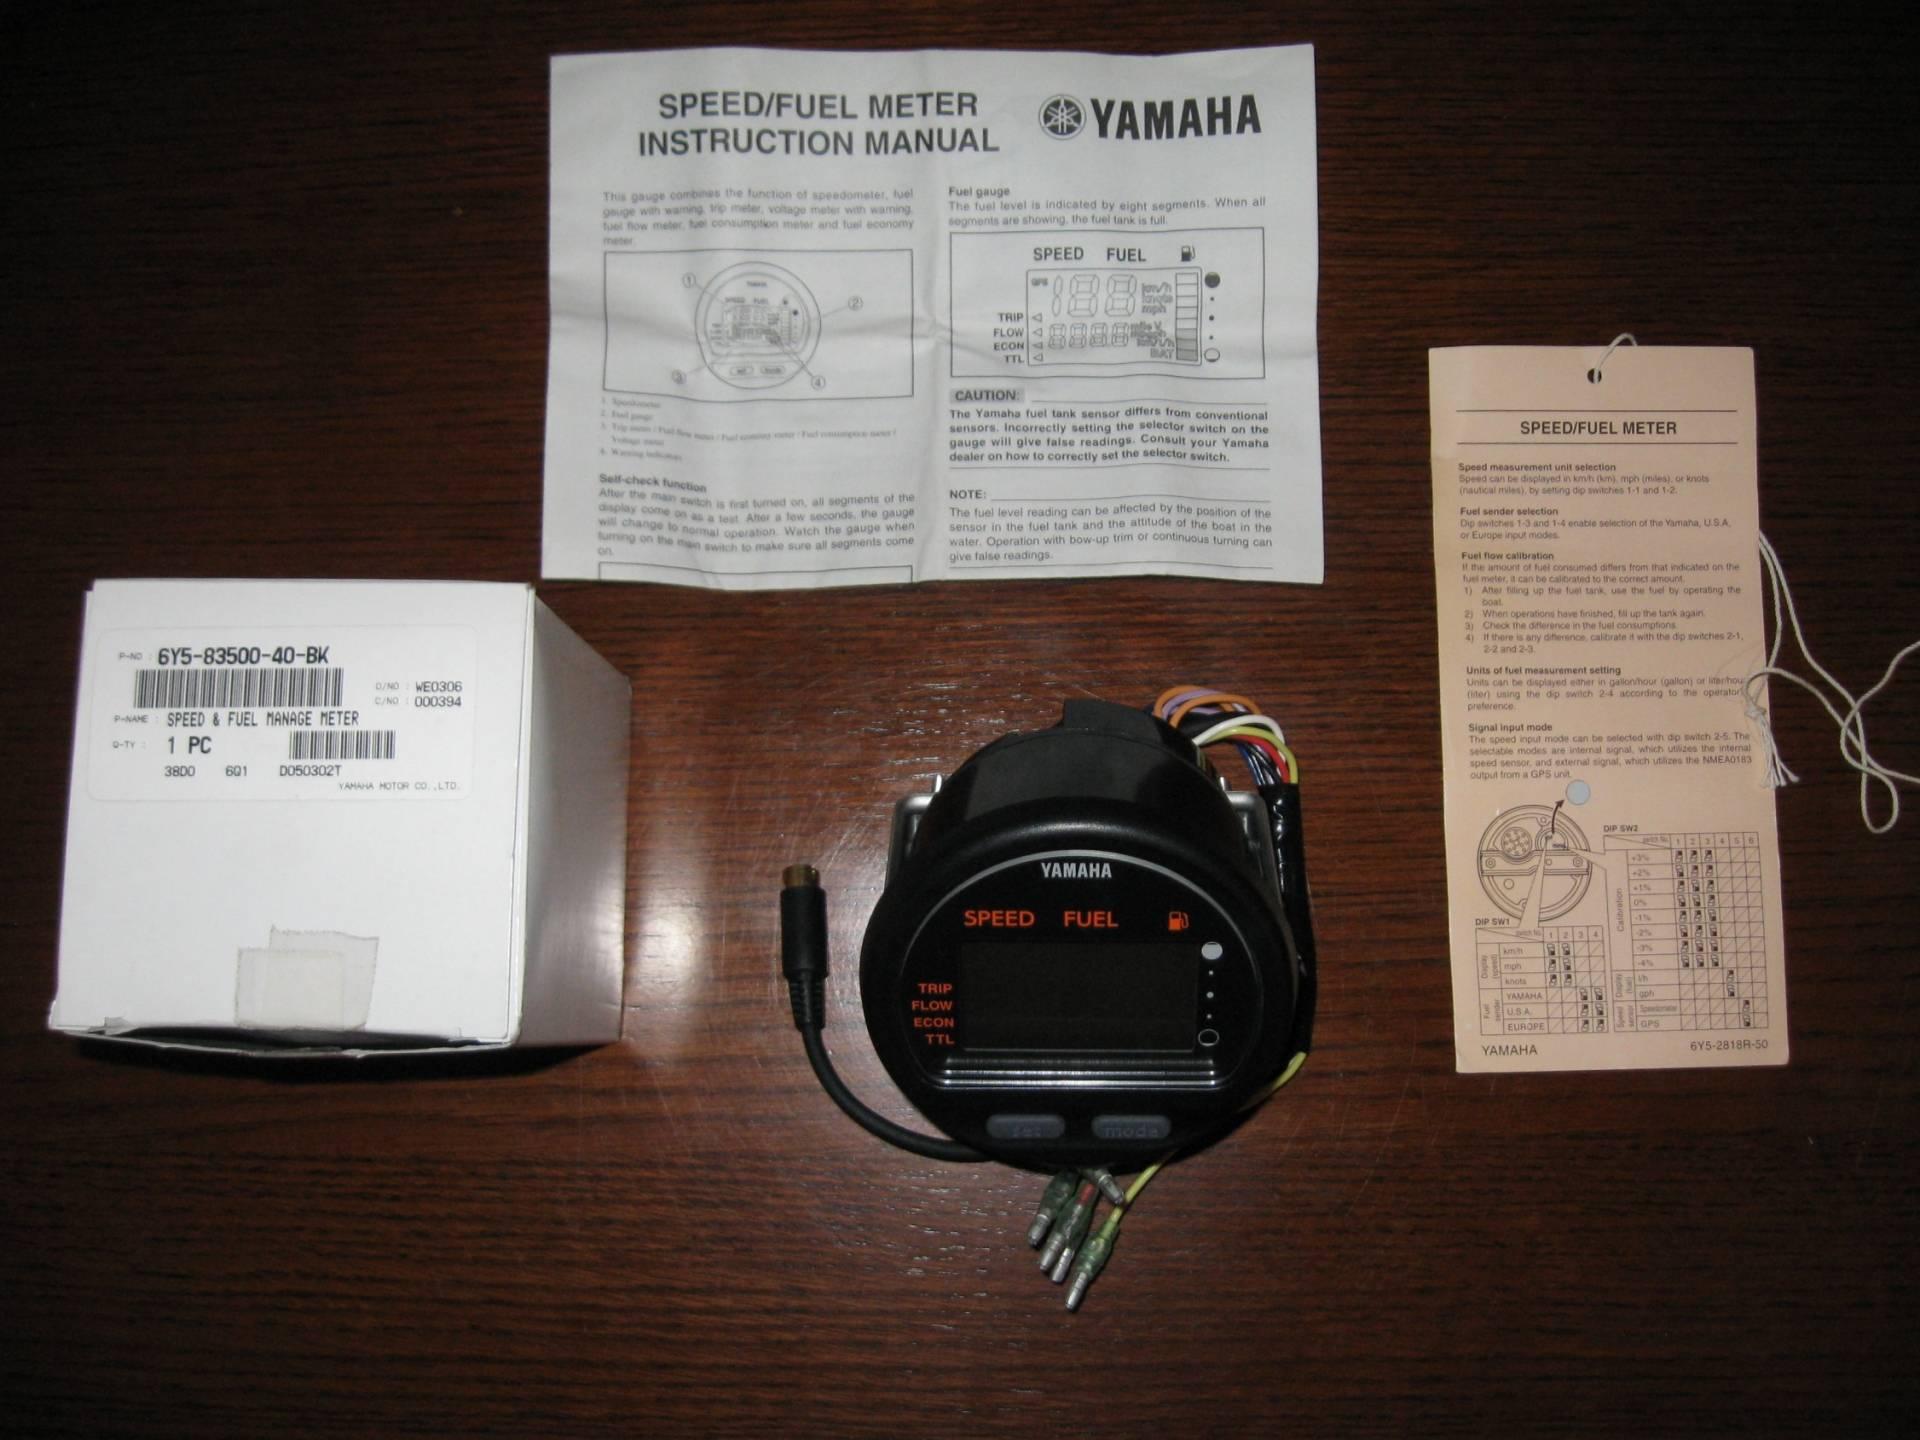 Yamaha Multifunction Gauge manual